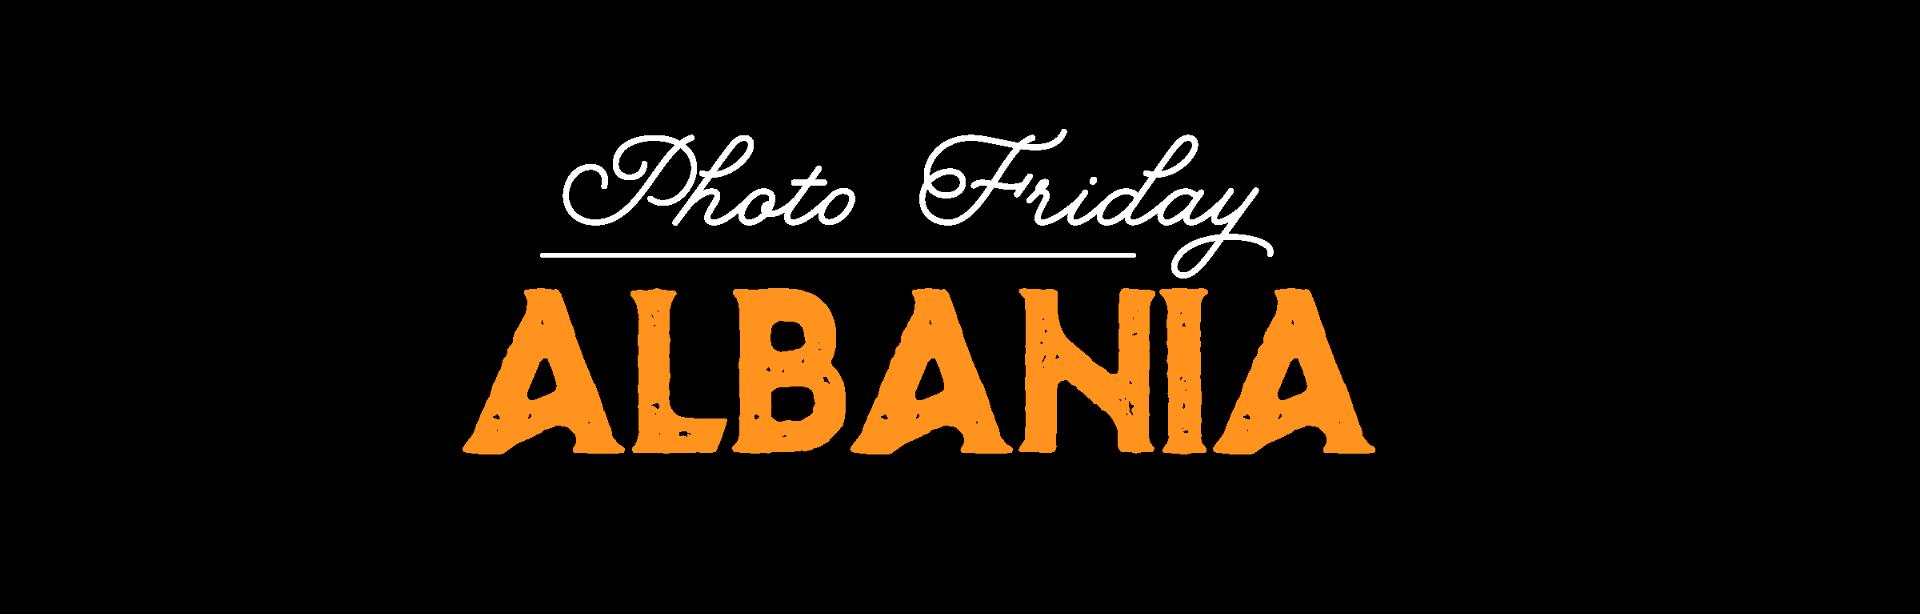 Albanian Highlights Bike Tour